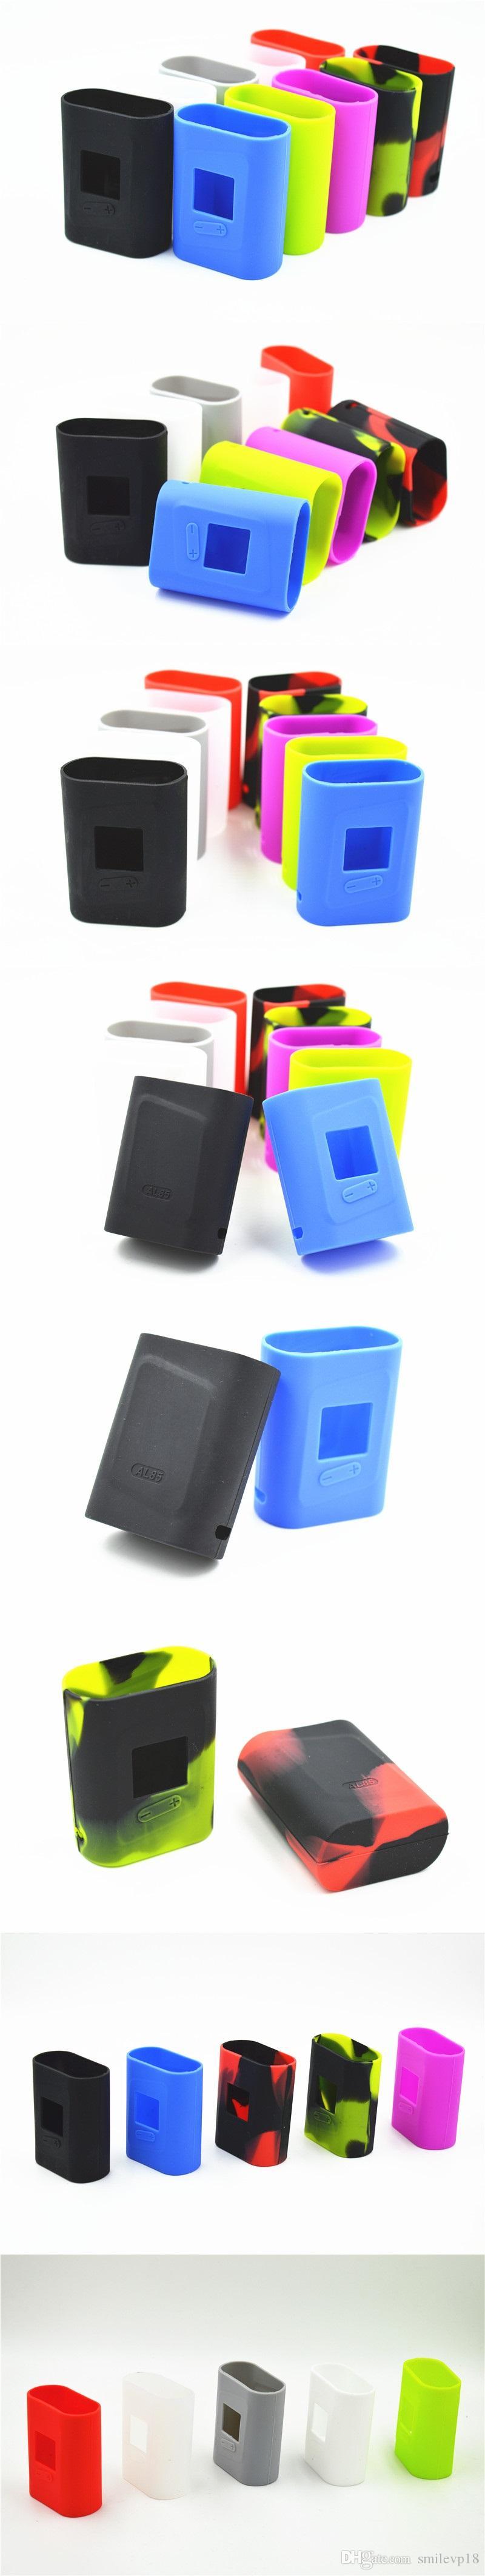 Für Smok AL85 Silikonhülle Bunte Gummi SMOK AL85W Schutzhülle Haut für Smoktech AL85W TC Box Mod Dhl-frei